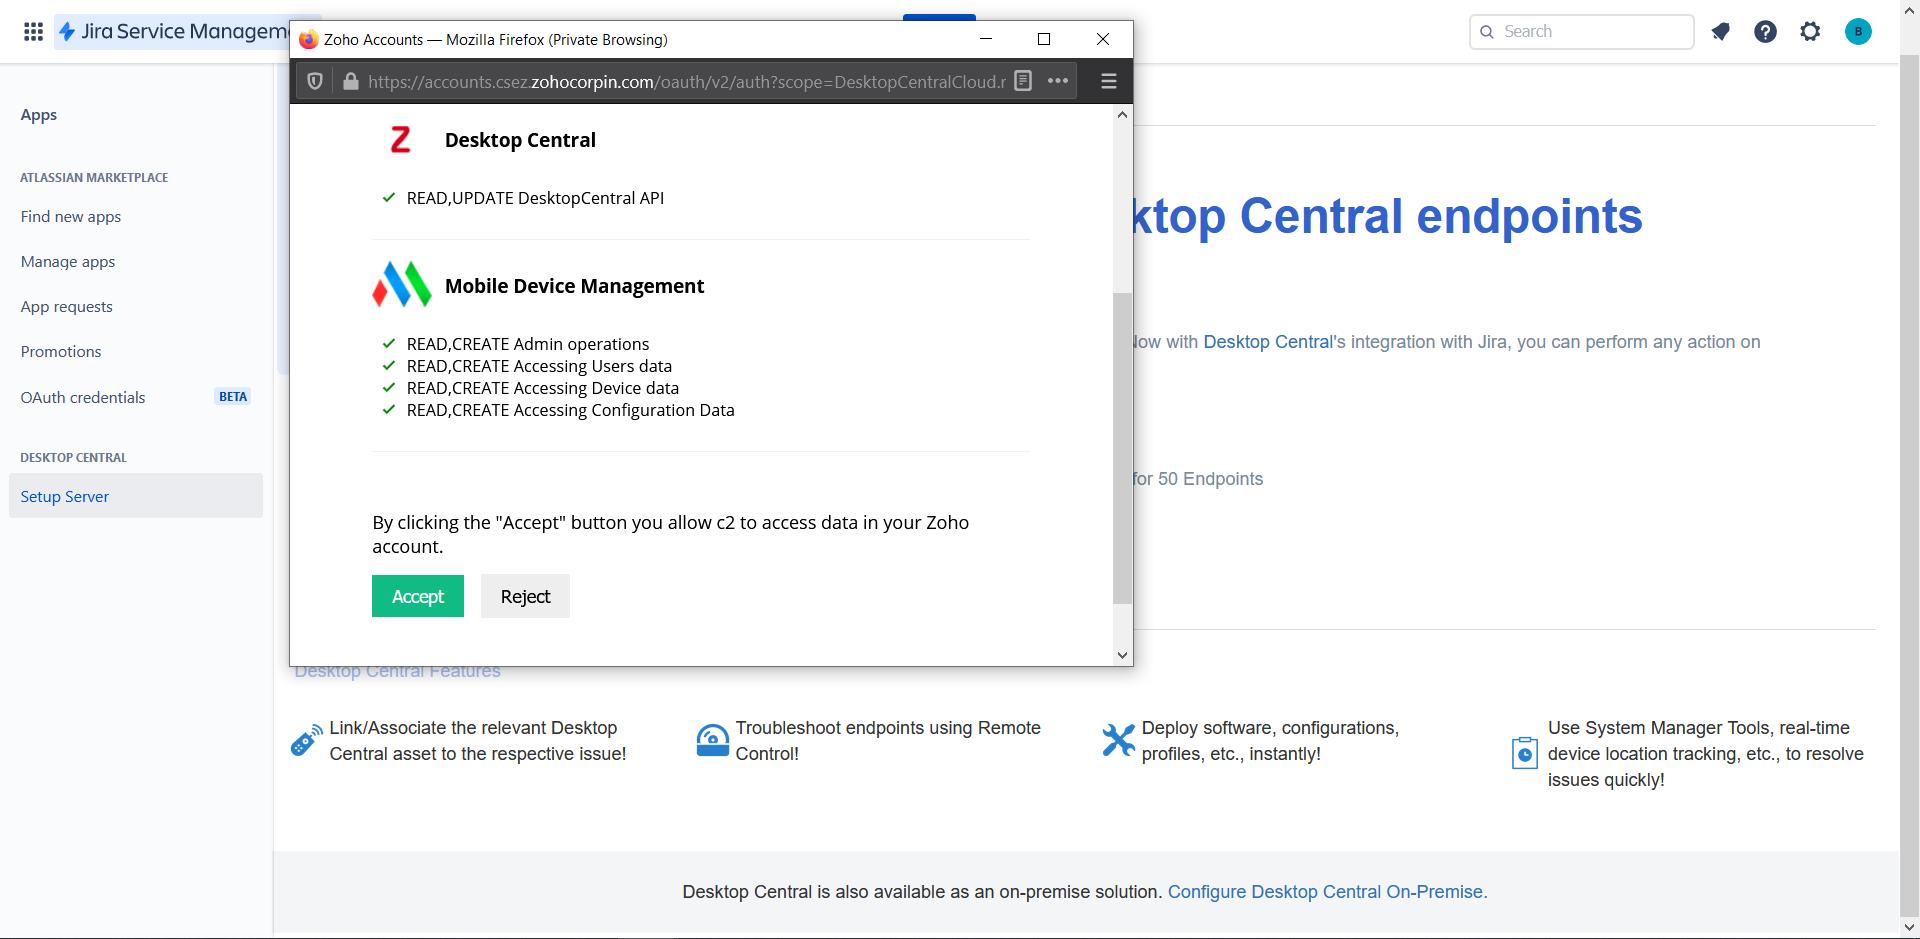 Desktop Central Cloud - Jira Service Management Cloud Integration